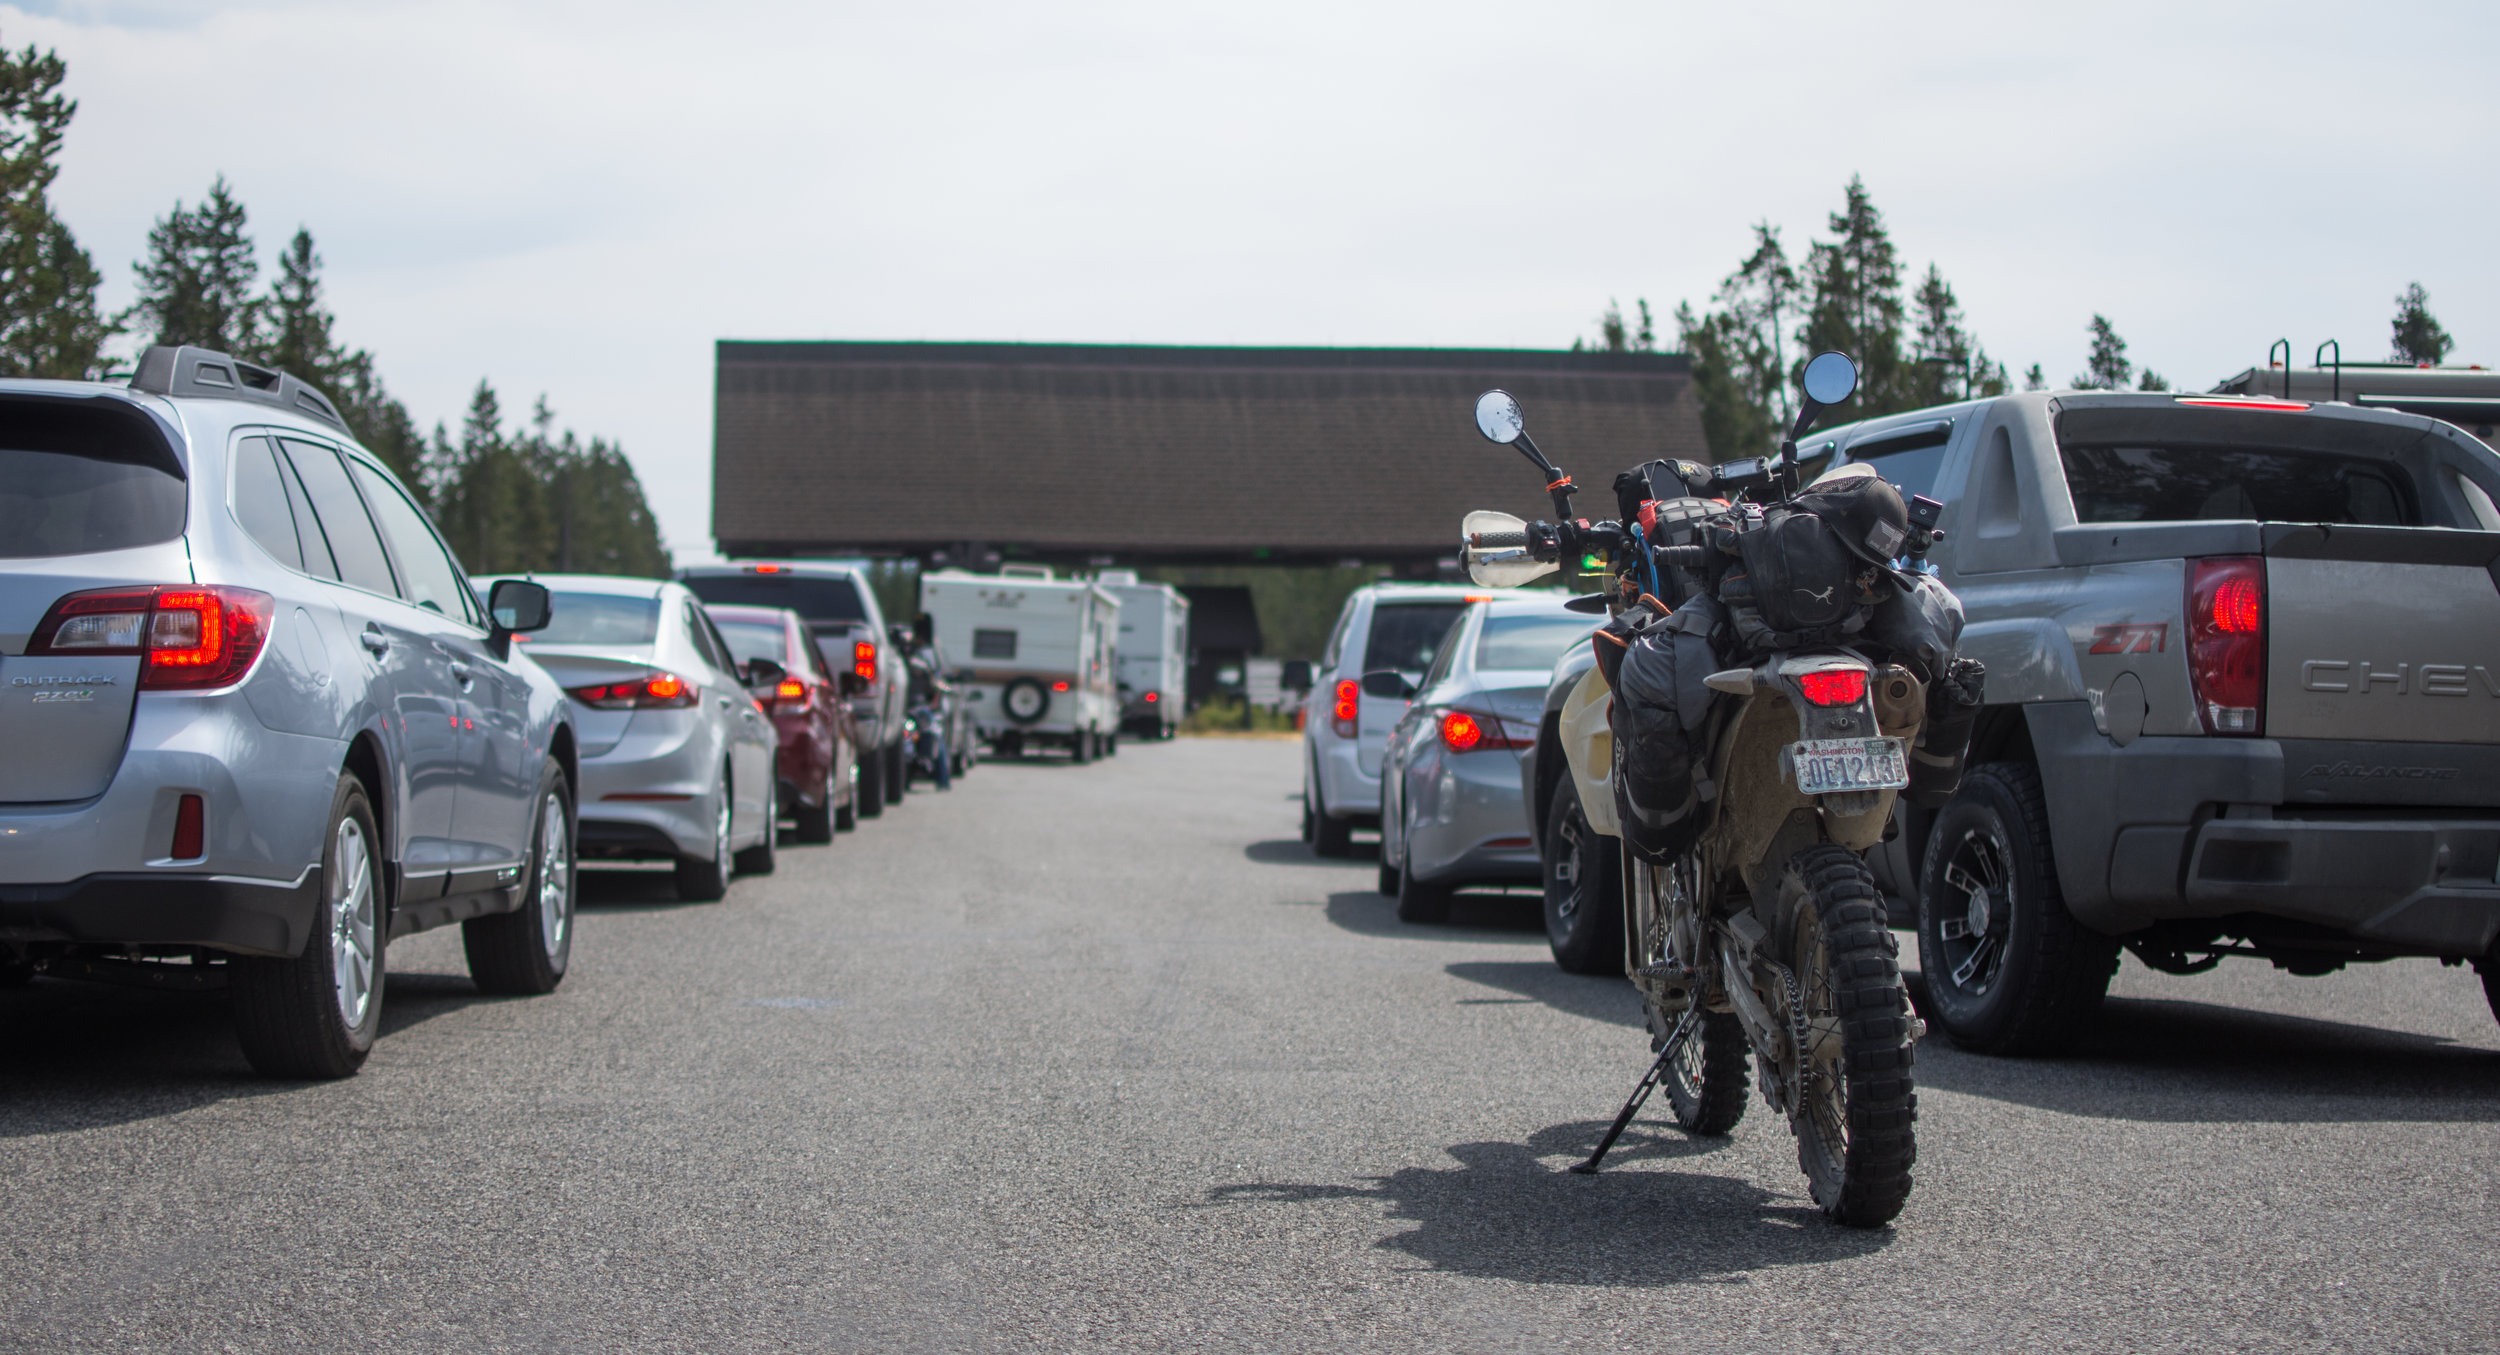 44.656751, -111.089905 . Yellowstone summer traffic.